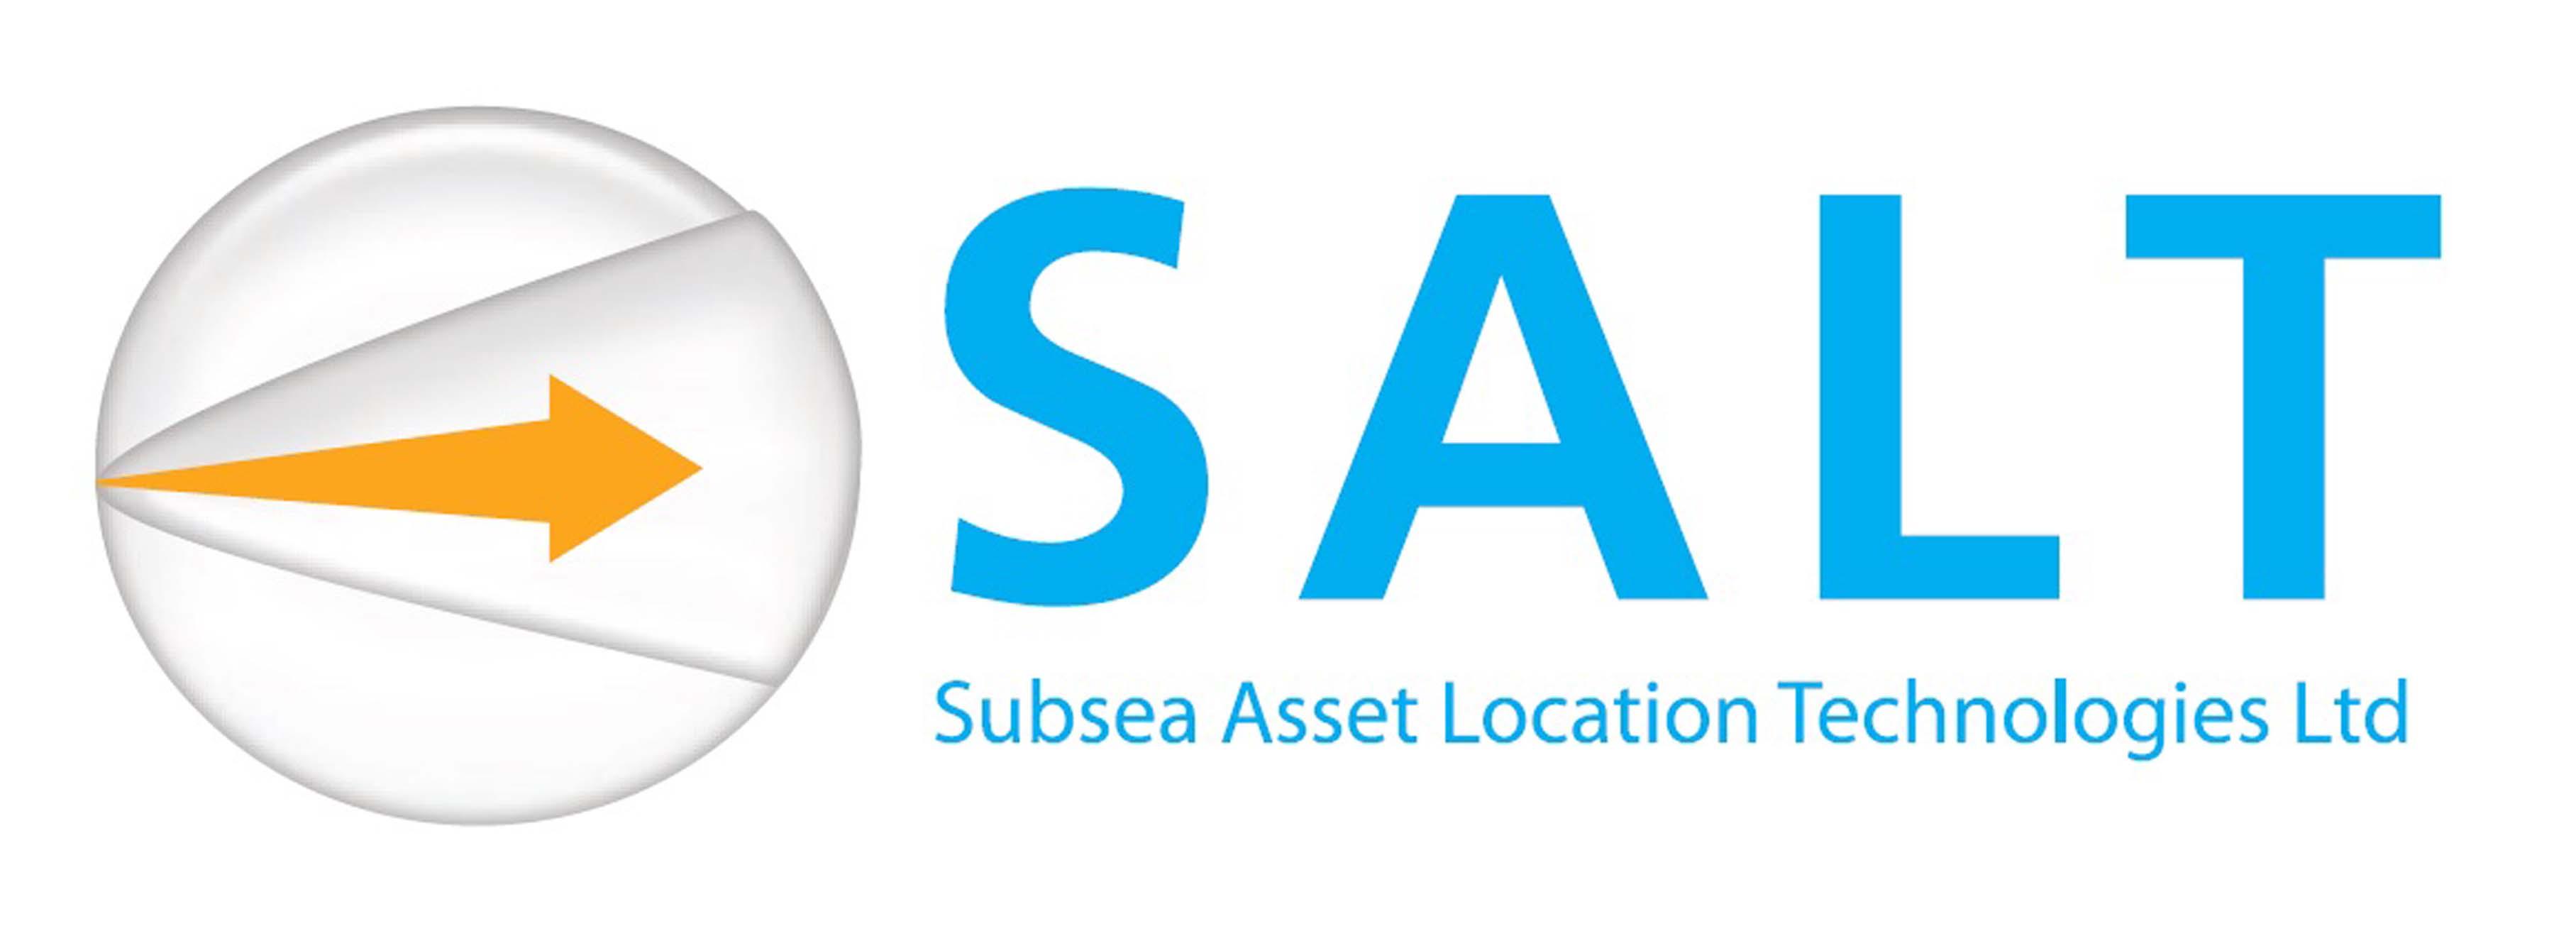 Subsea Asset Location Technologies Ltd